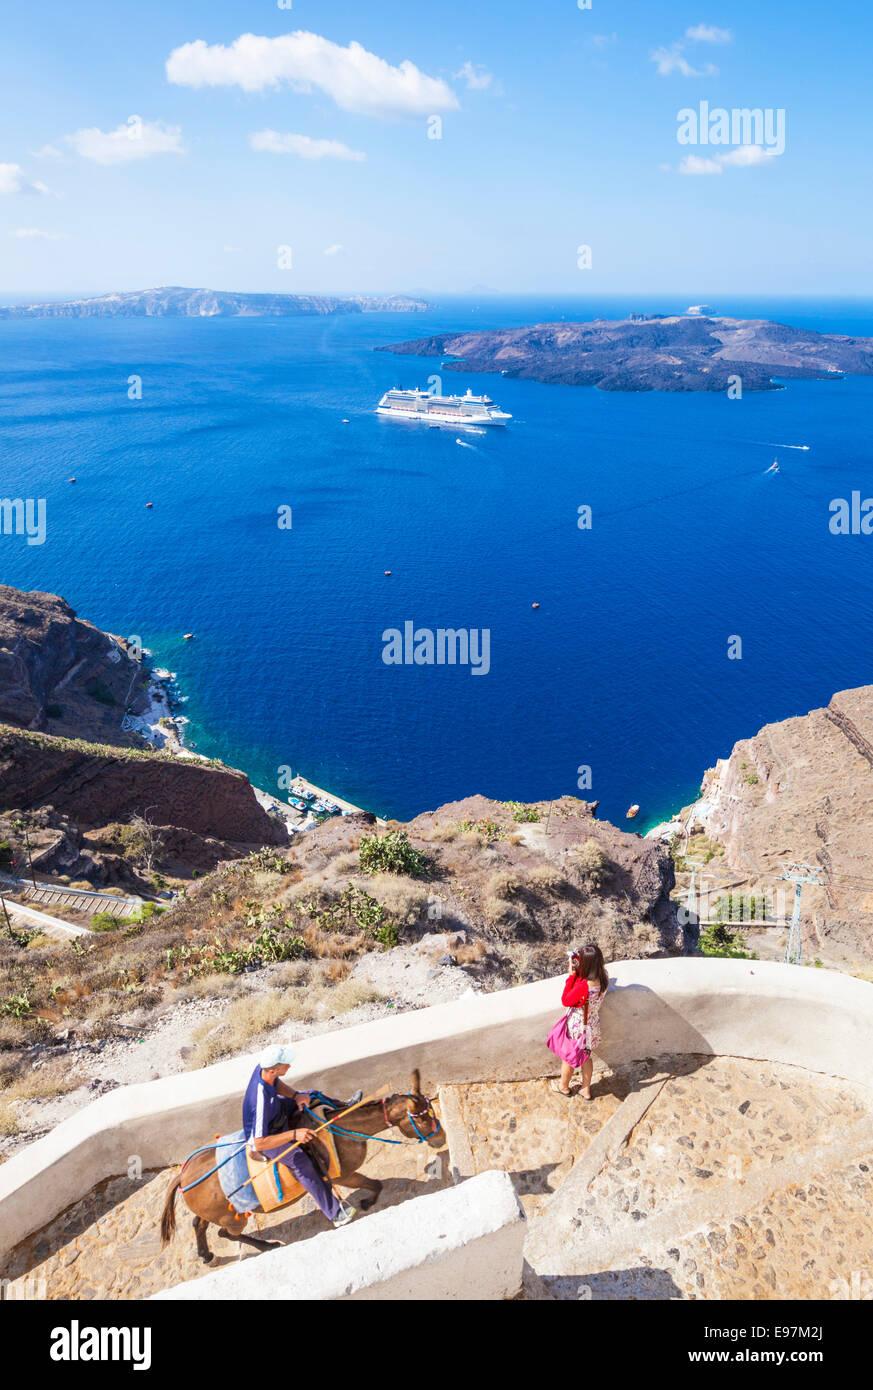 Donkey, Caldera and Cruise ship, Fira, Santorini, Thira, Cyclades islands, Aegean Sea, Greece, EU, Europe - Stock Image